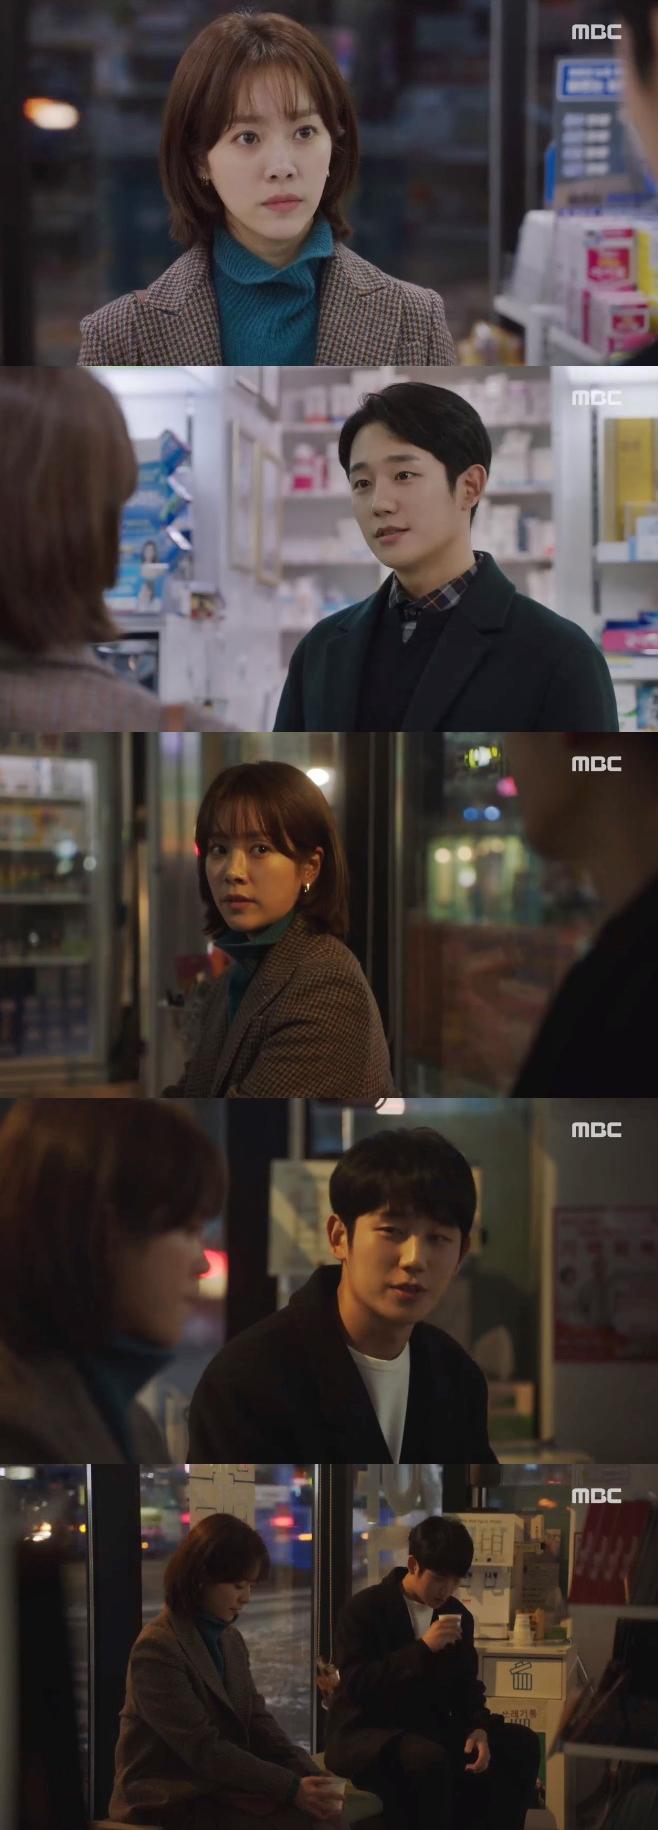 MBC 봄밤, 정해인 한지민